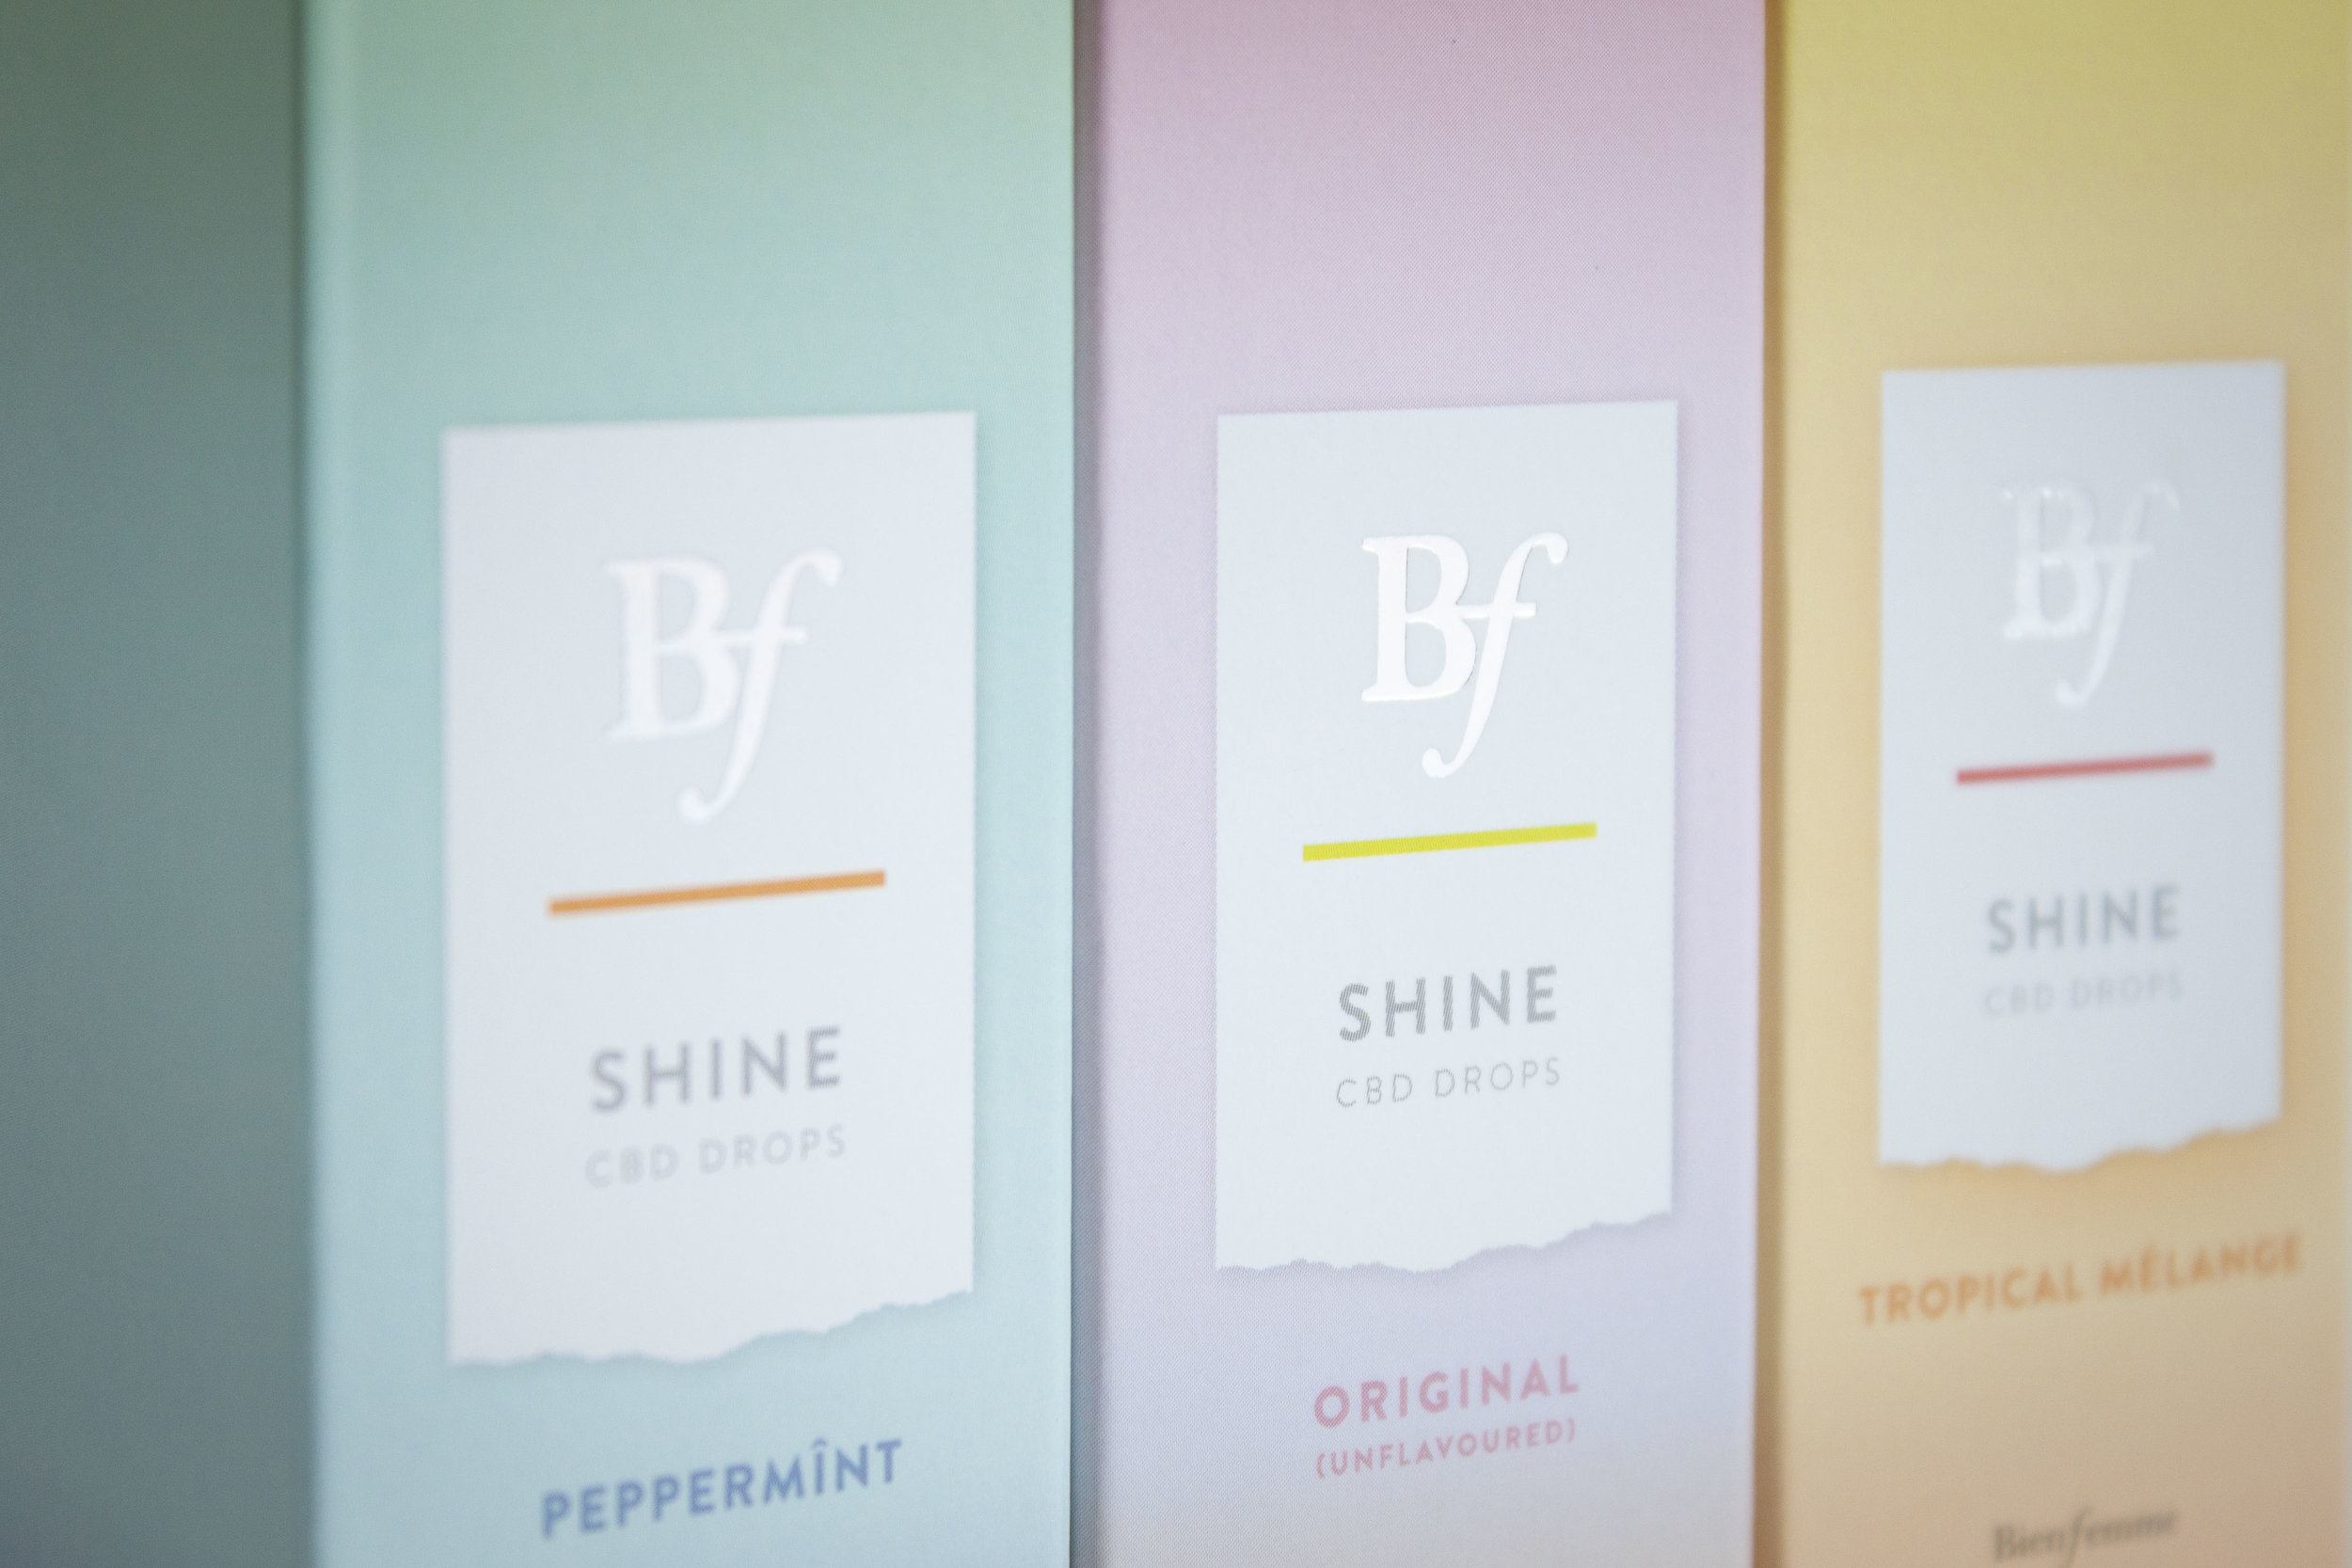 Bien Femme Shine Packaging